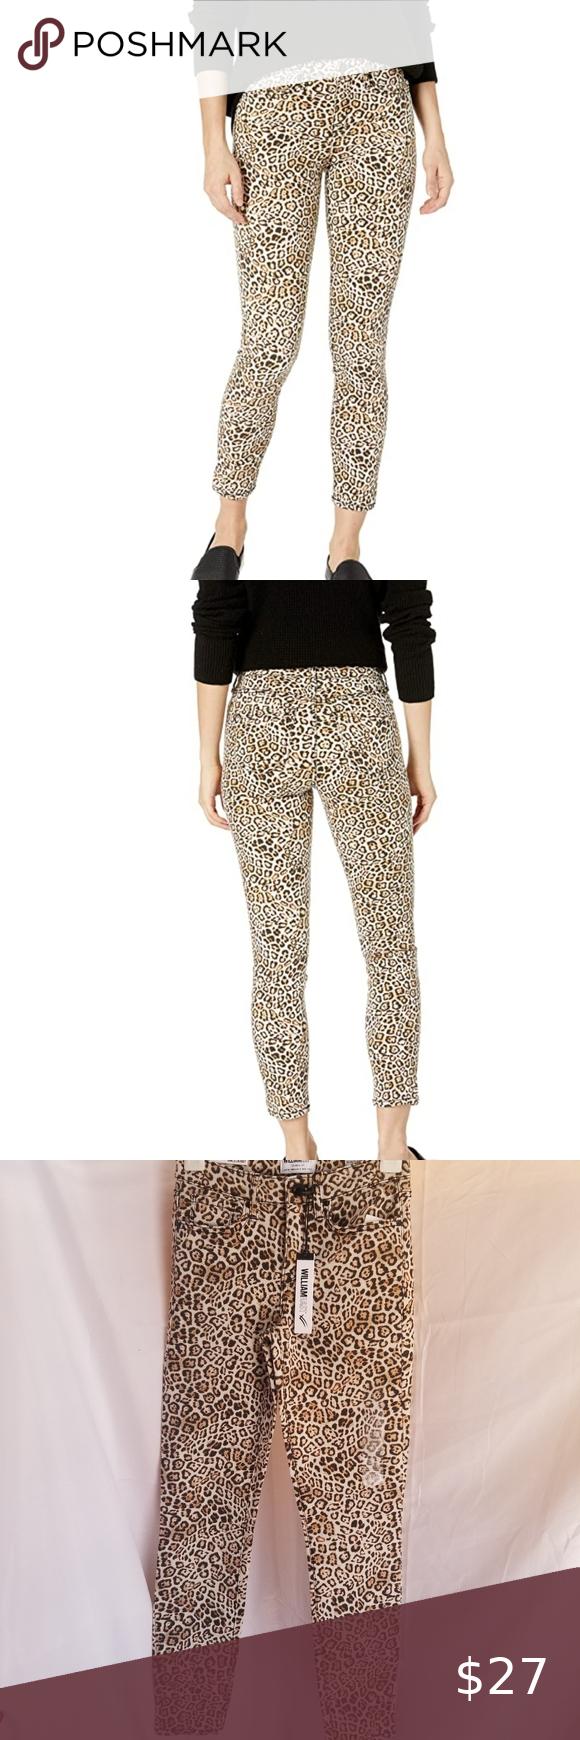 William Rast cheetah print ankle skinny jeans